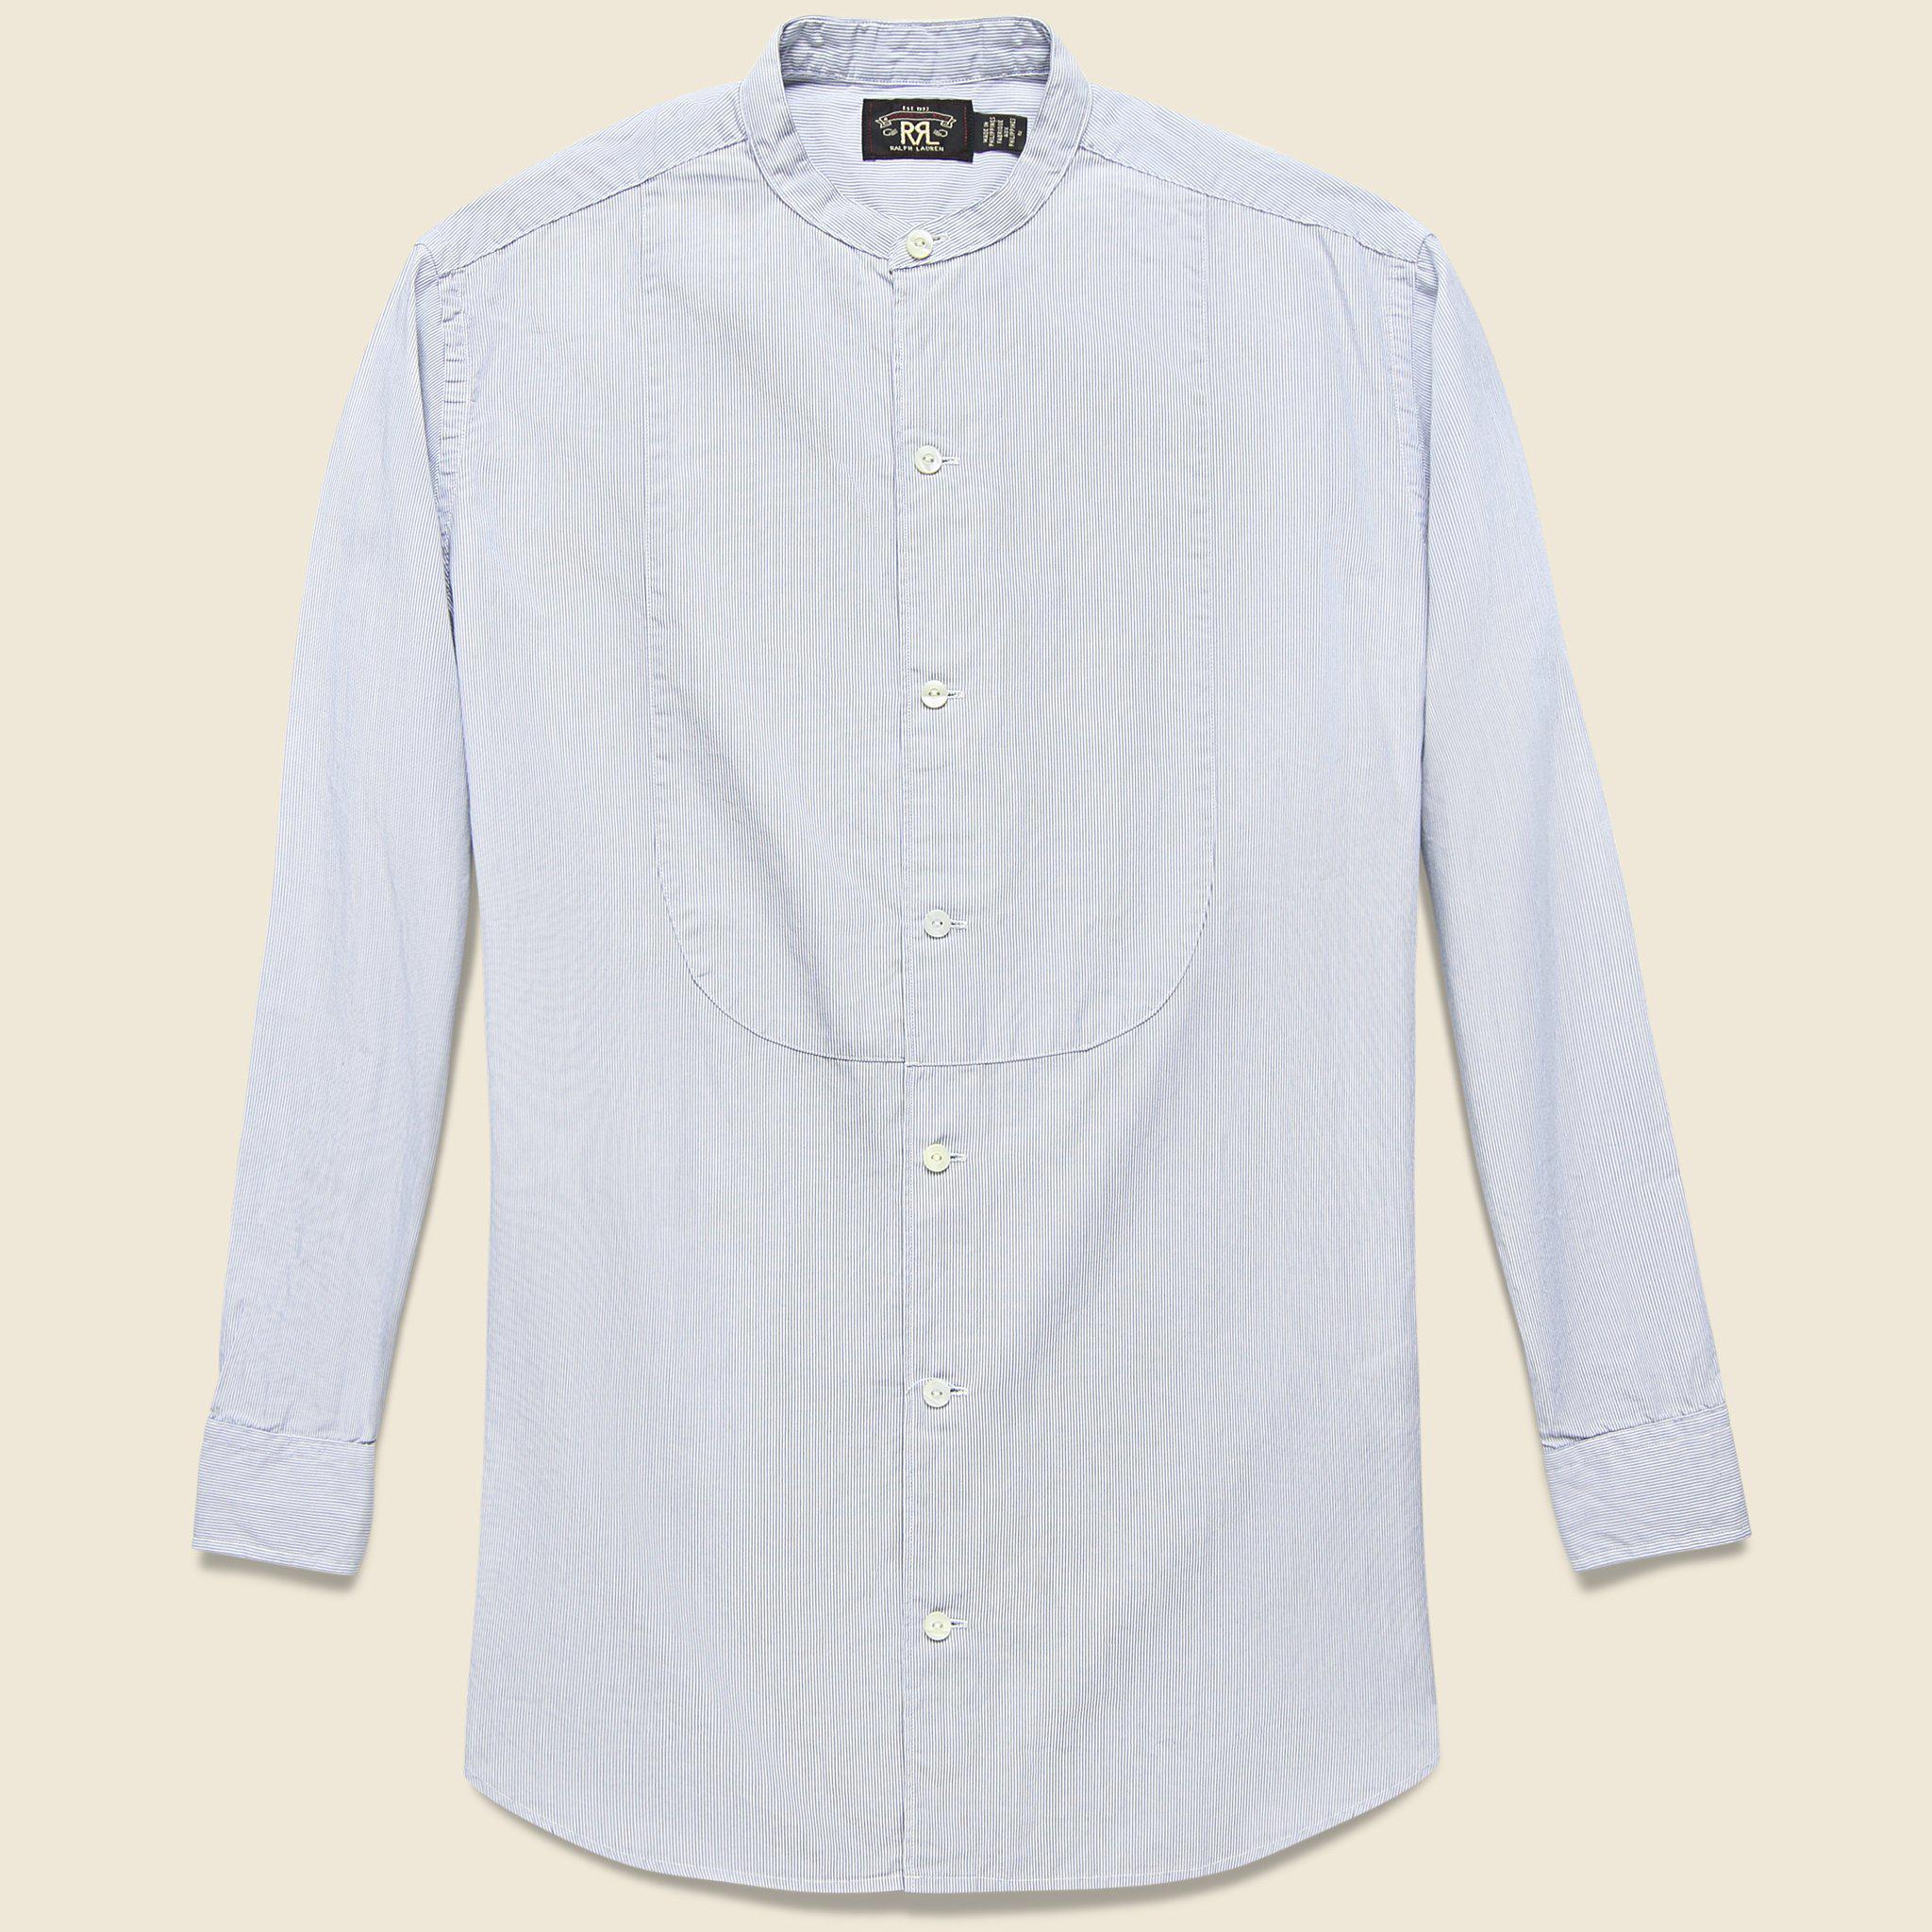 a9e8b922 Lyst - RRL Michelle Bib Shirt - Blue/white Stripe in Blue for Men